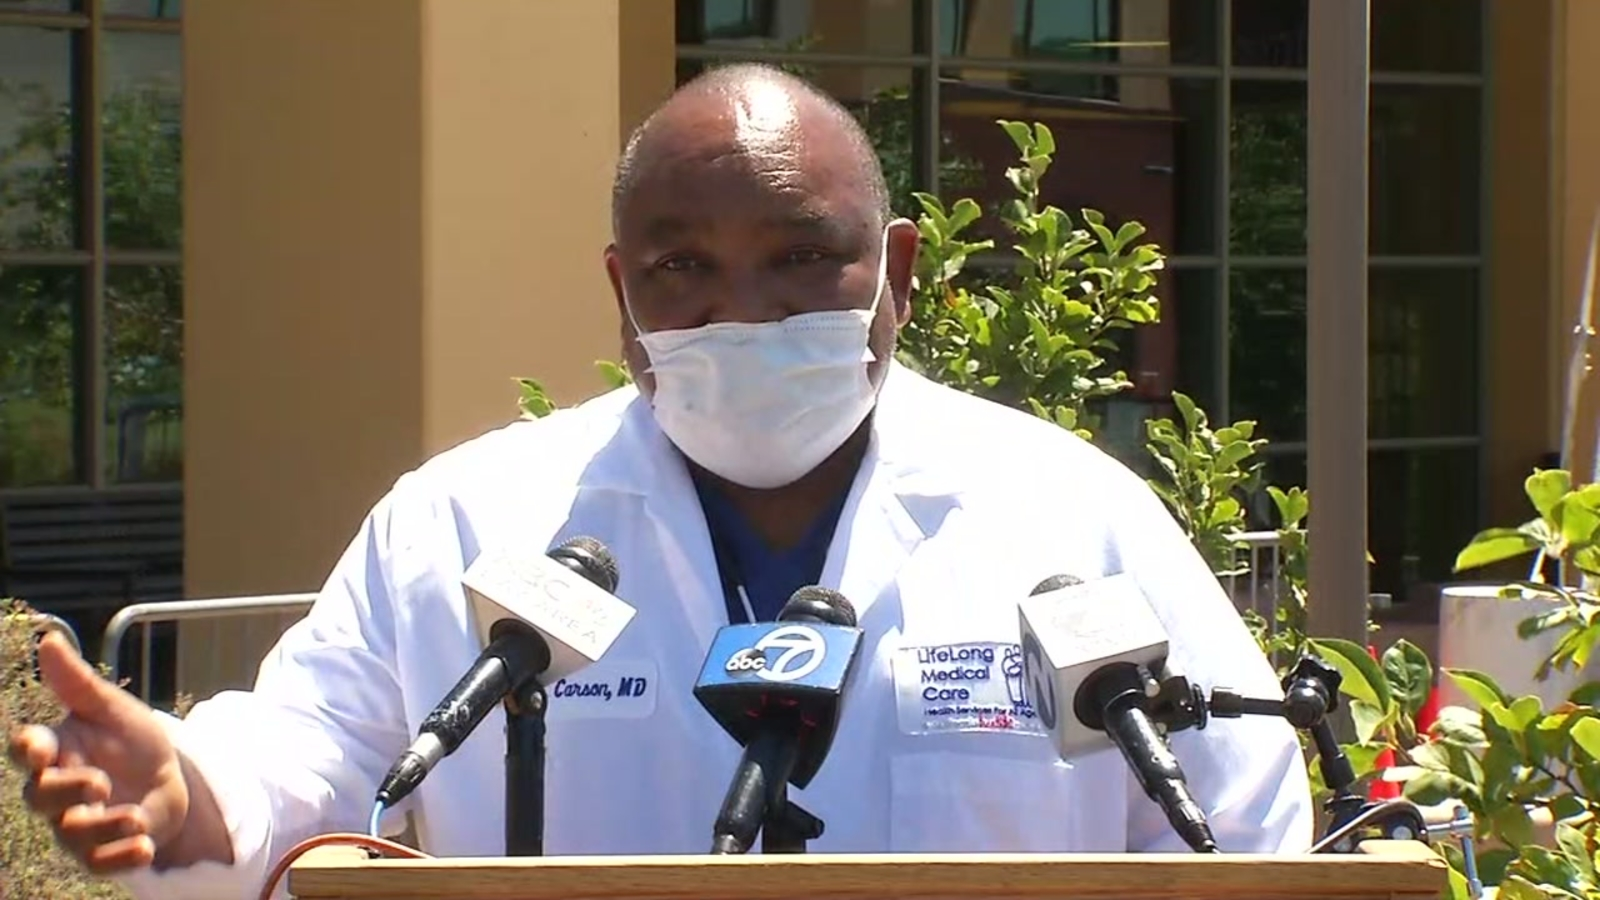 California Doctor Tells Off Coronavirus Deniers In Passionate Speech Abc7 San Francisco Call an ambulance dream team animatic. embarrassed and a little pissed off richmond doctor tells off coronavirus deniers in passionate speech